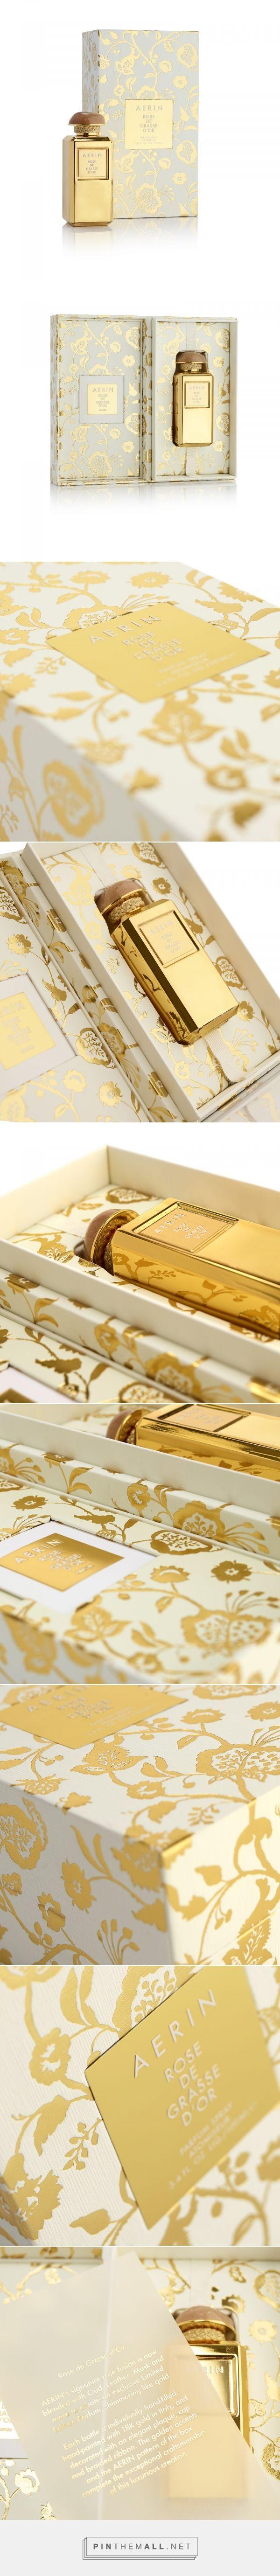 Aerin Rose de Glasse d'Or Fragrance - Packaging of the World - Creative Package Design Gallery - http://www.packagingoftheworld.com/2017/06/aerin-rose-de-glasse-dor-fragrance.html